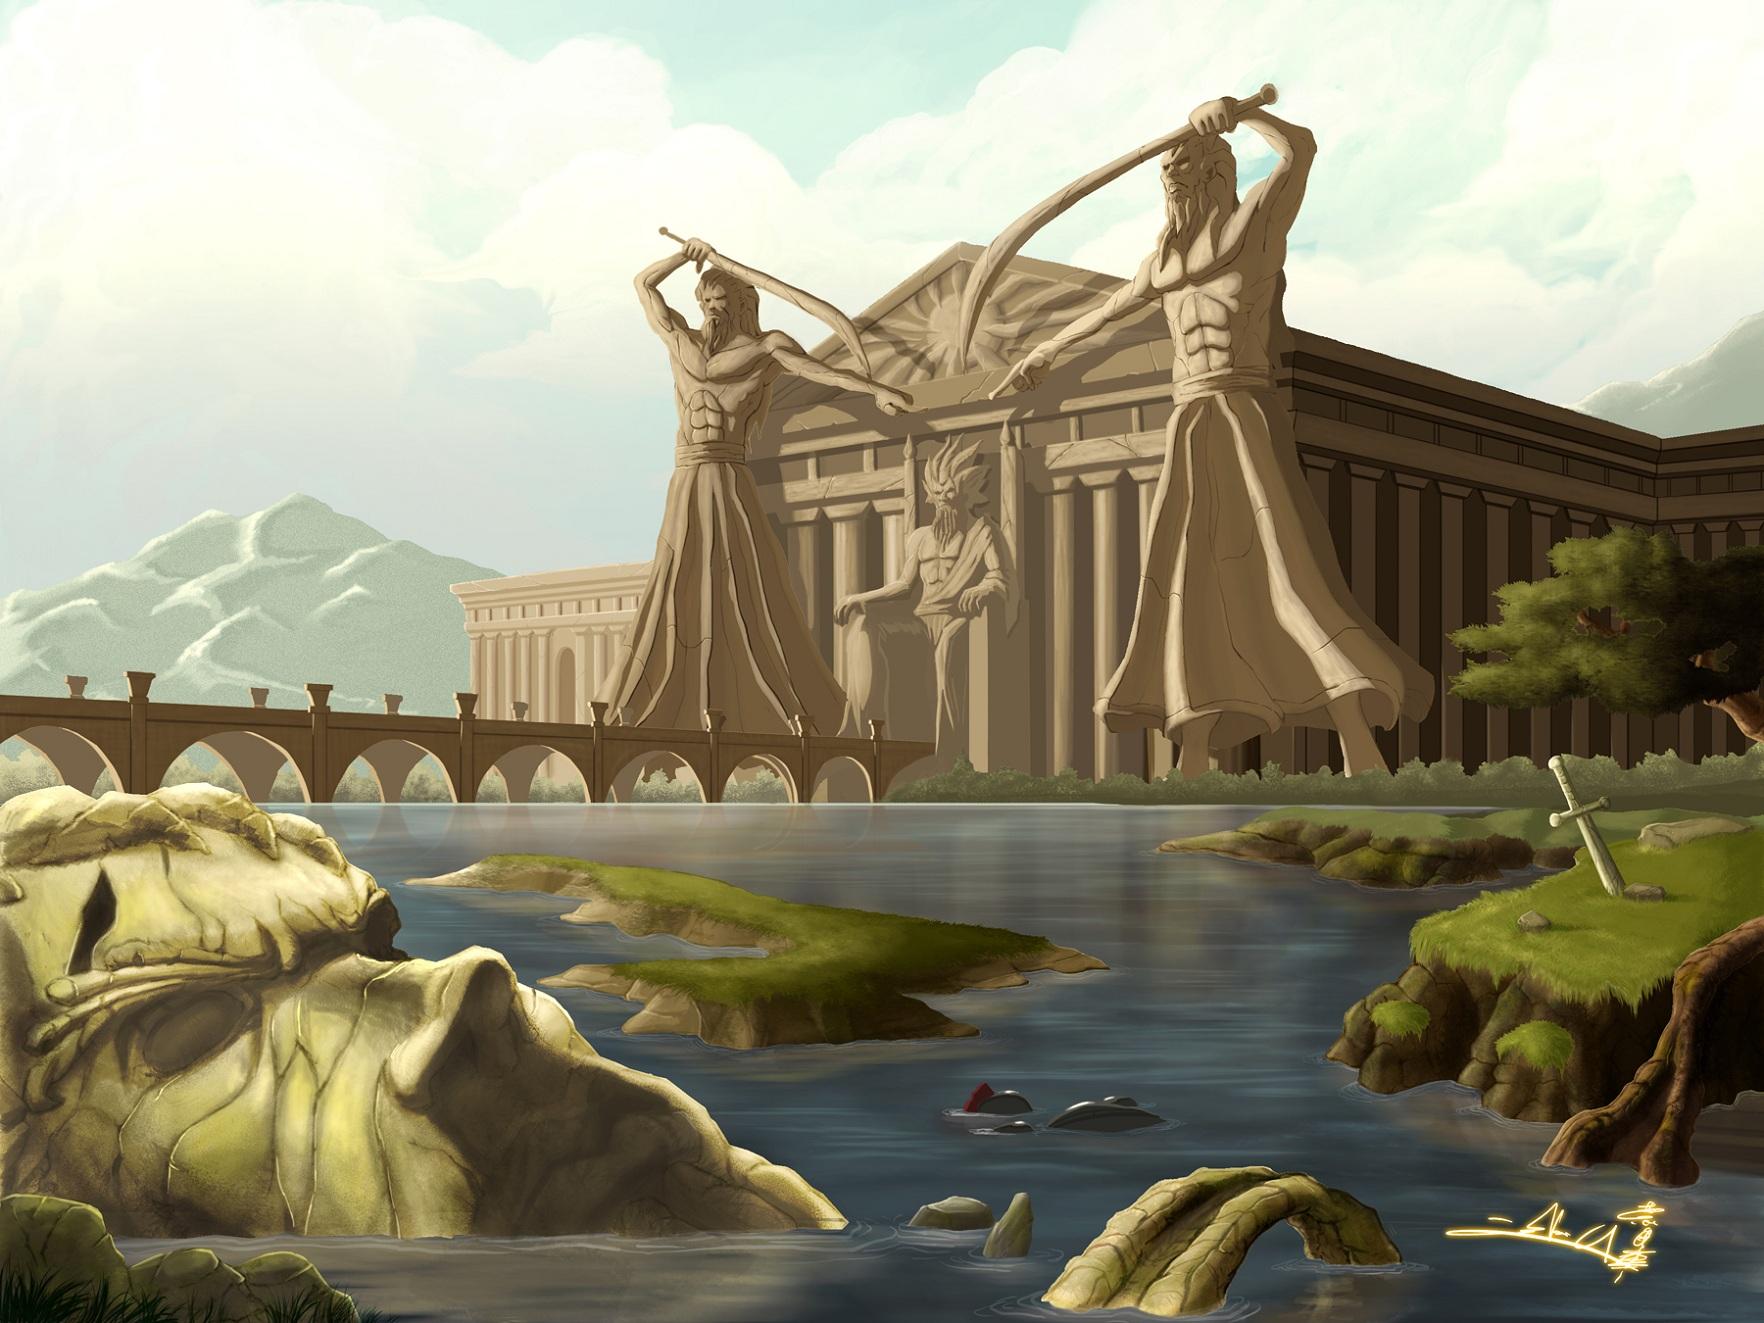 картинки фэнтези древняя греция видел латиноамериканок